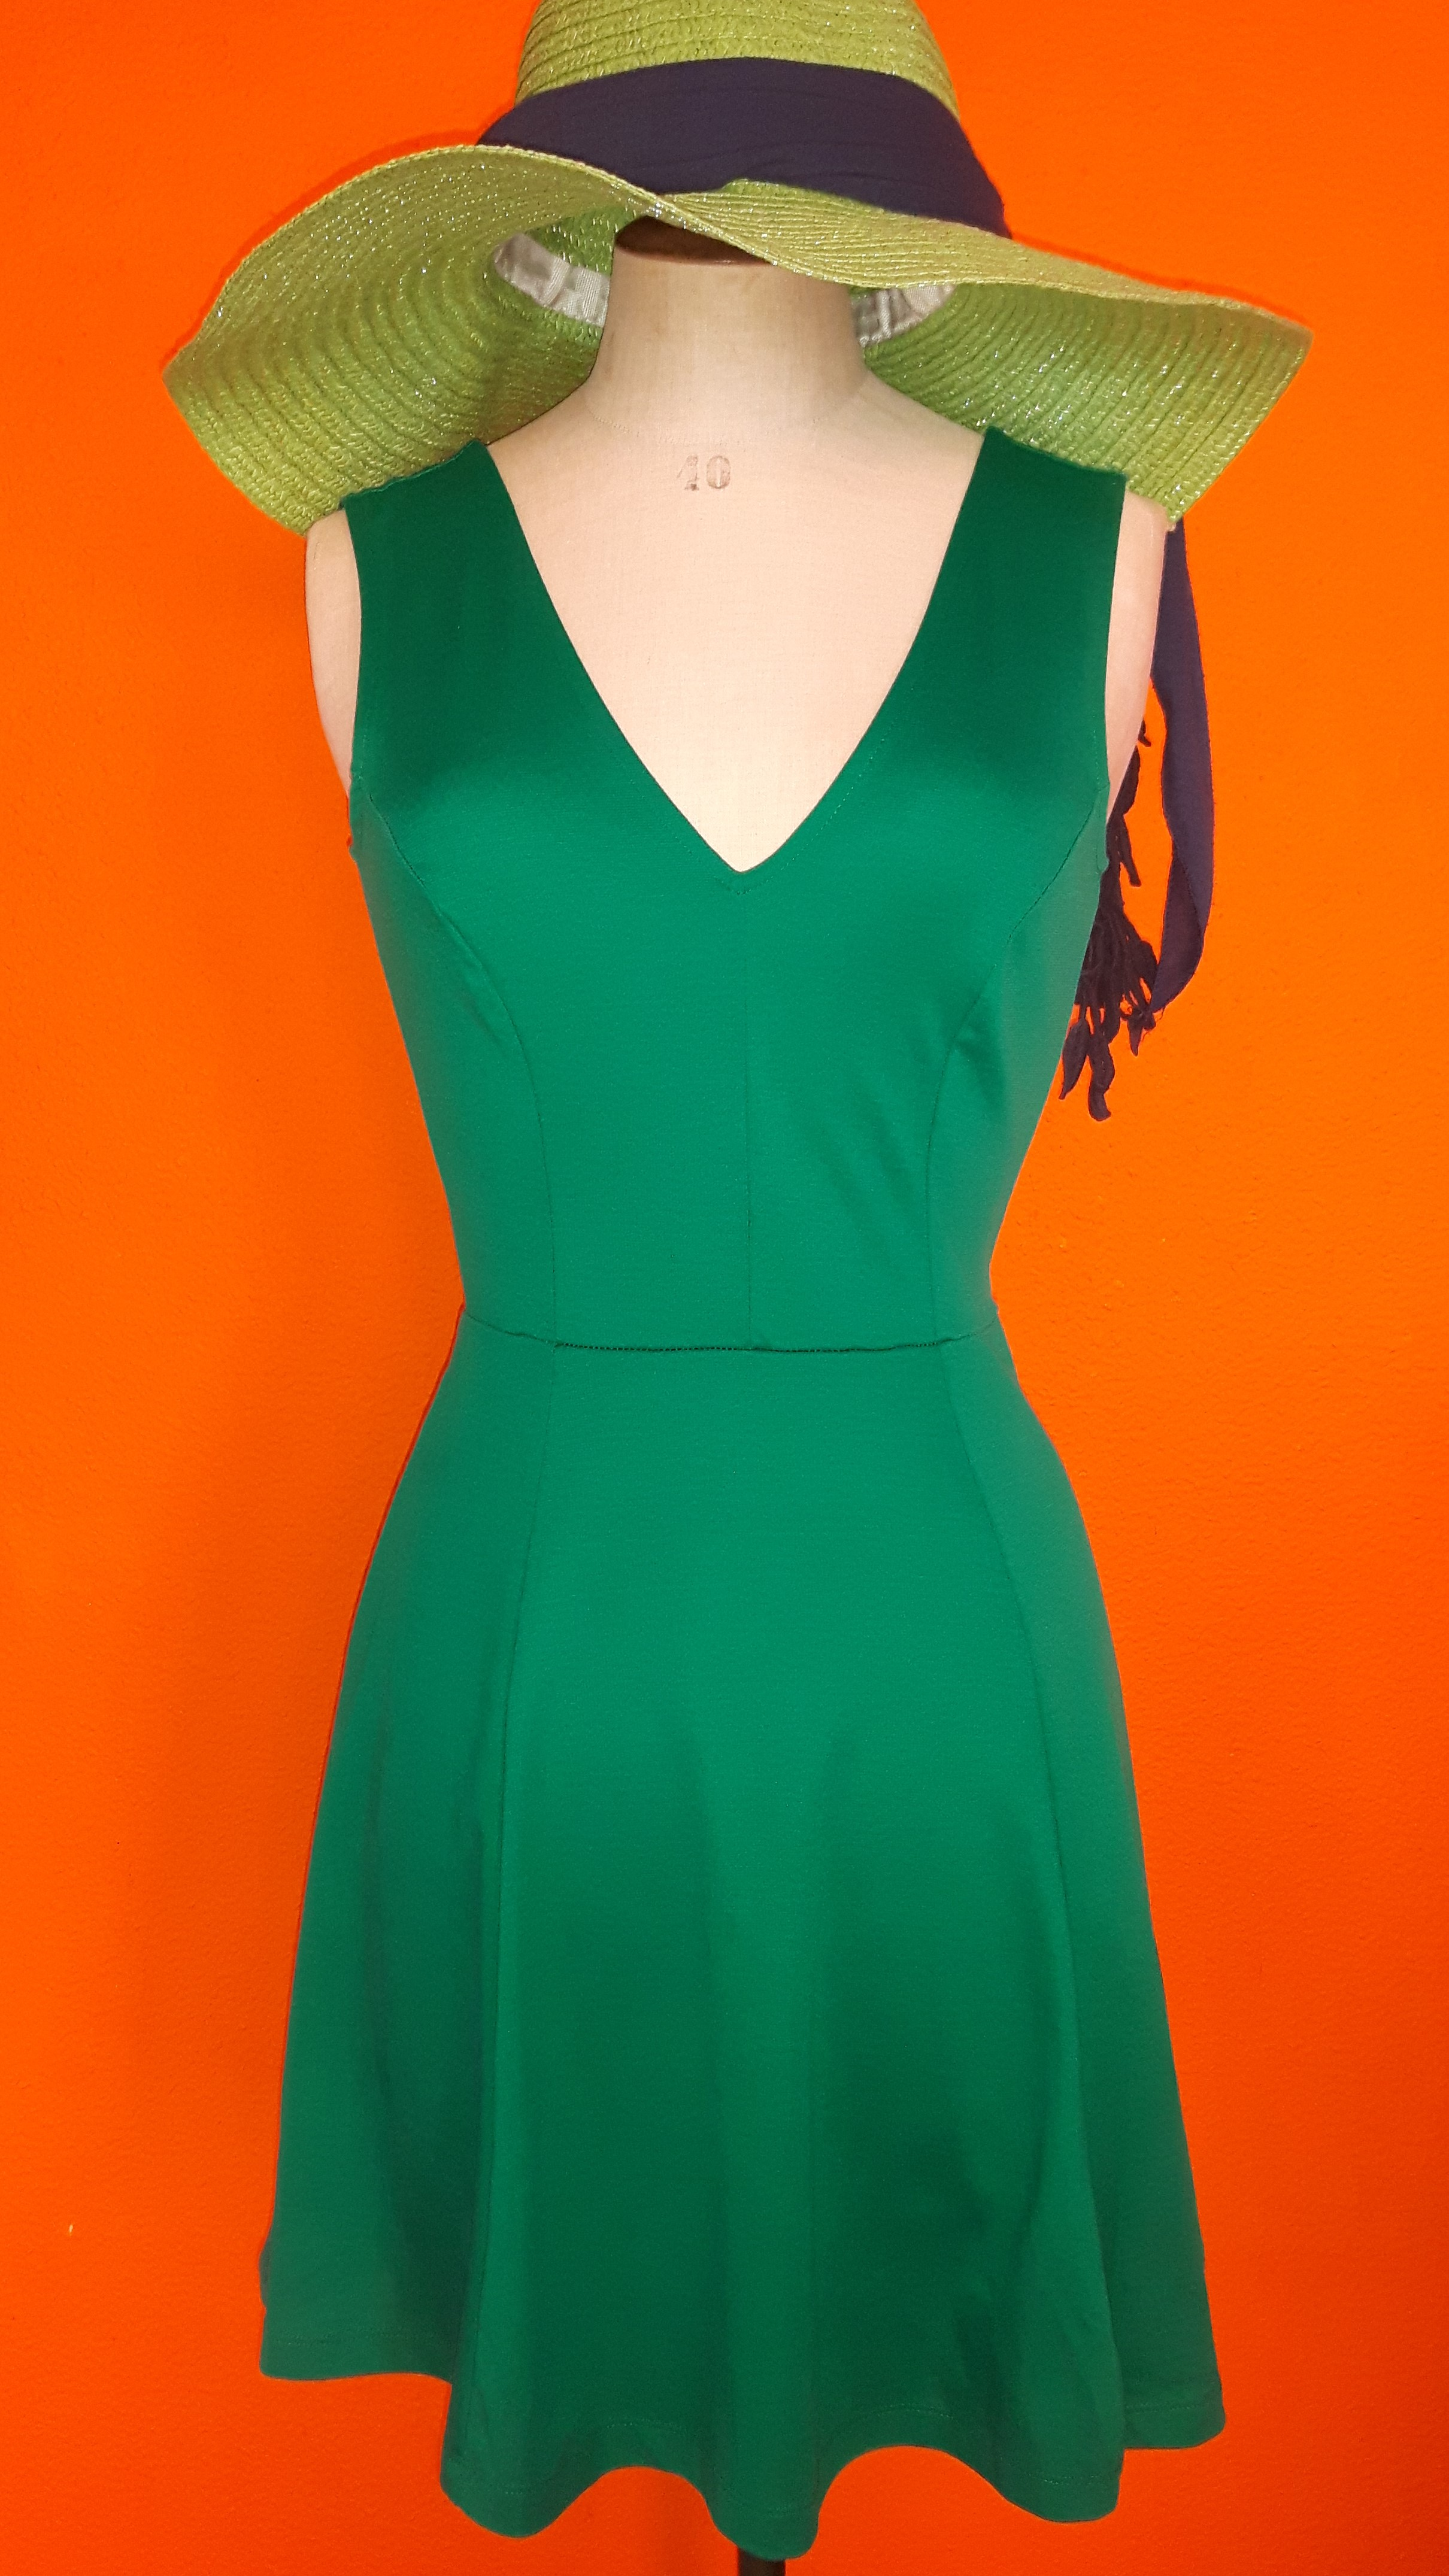 Vintage groen jurkje maat S,Goosvintage